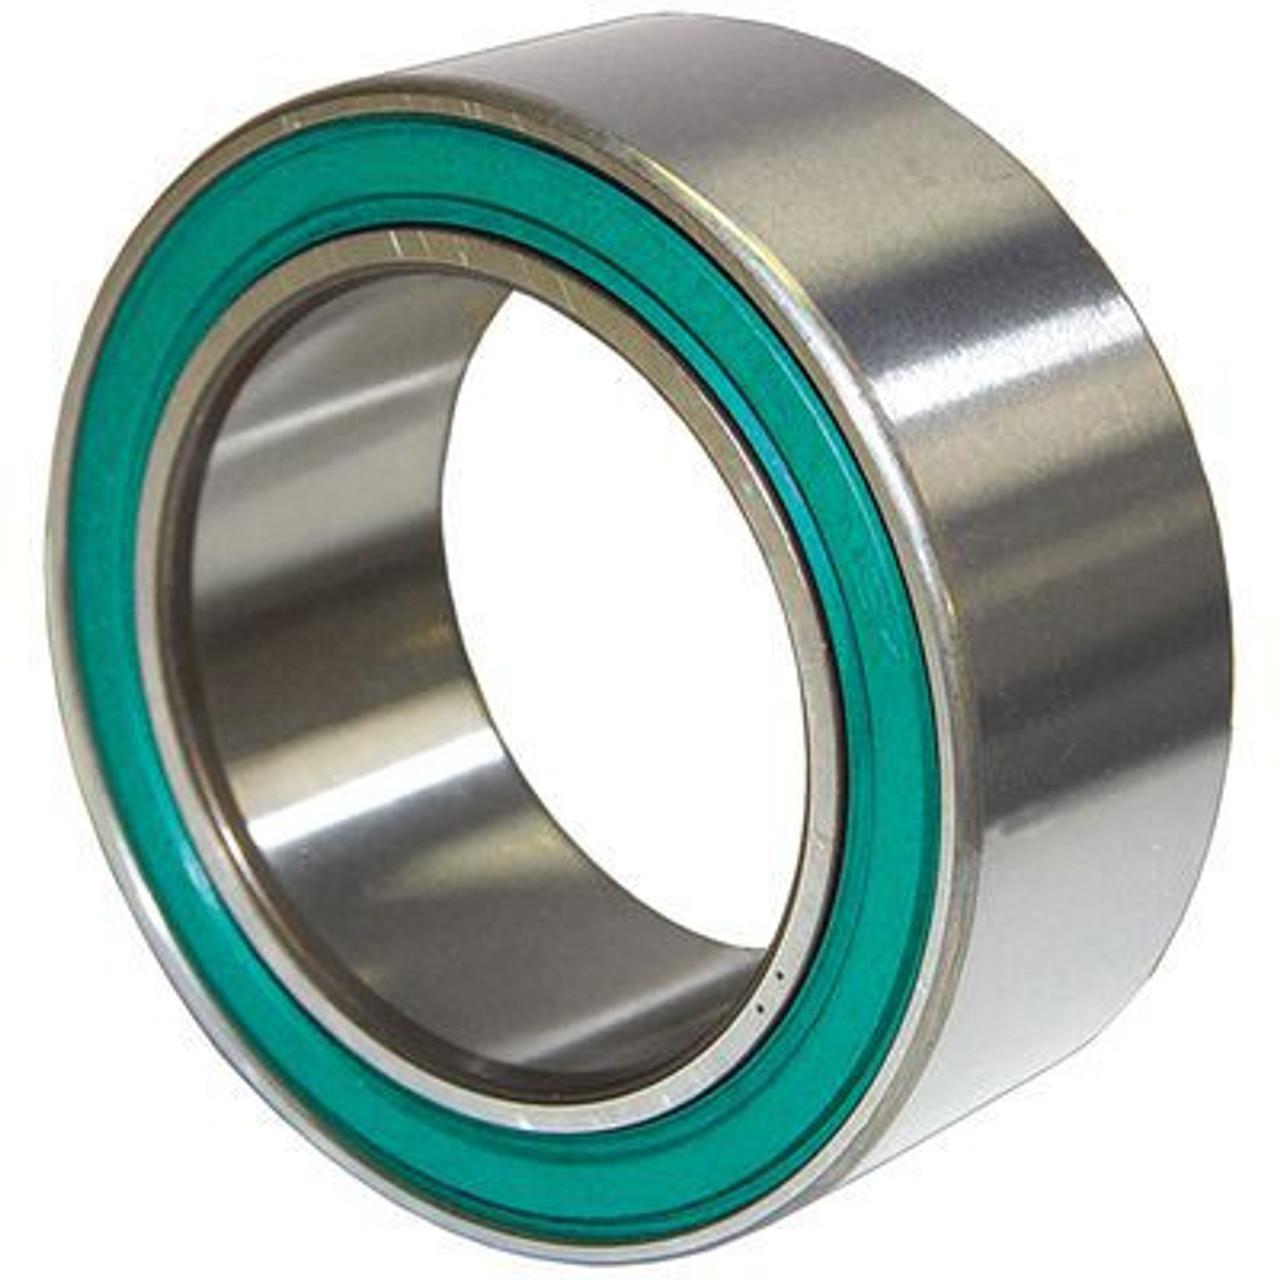 Green Clutch bearing